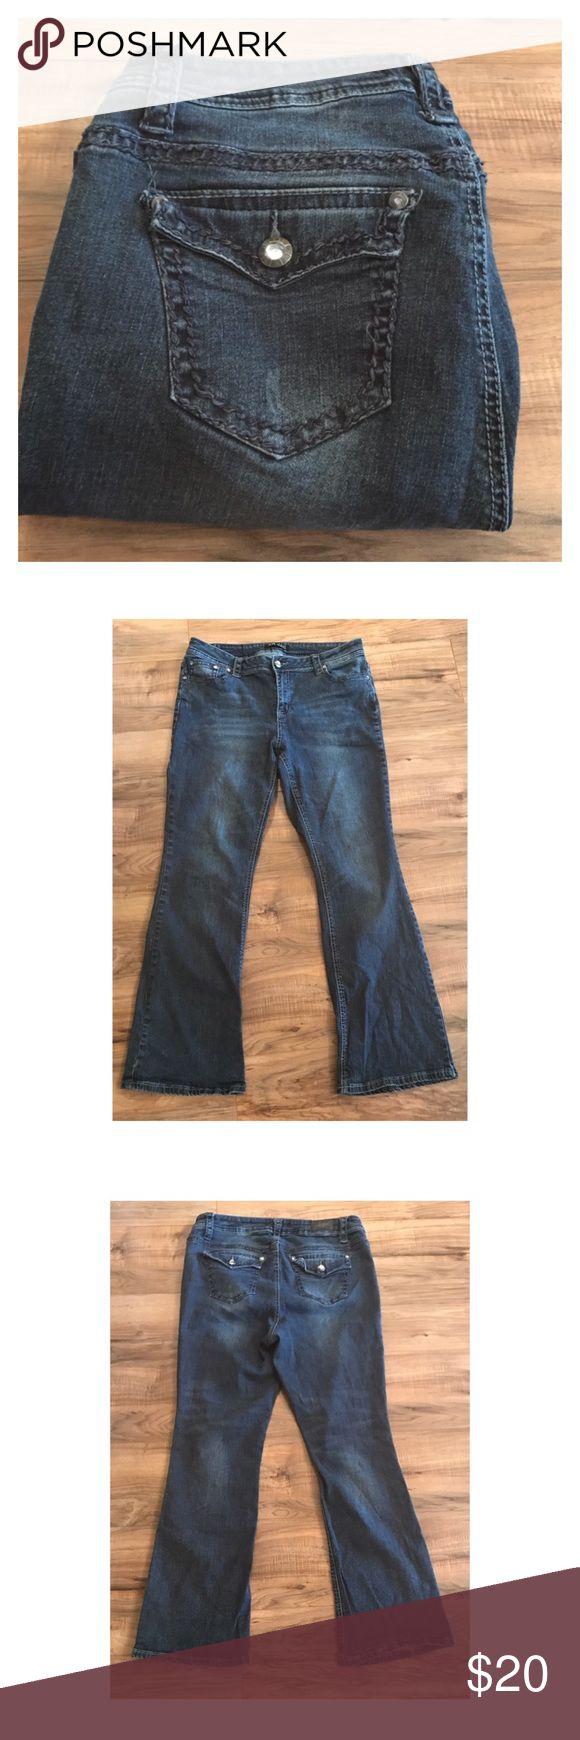 "ZCO Jeans 16 Medium wash ZCO jeans size 16 in good condition. Waist 18"", rise 10"", inseam 30"". Measurements taken flat. ZCO Jeans Flare & Wide Leg"